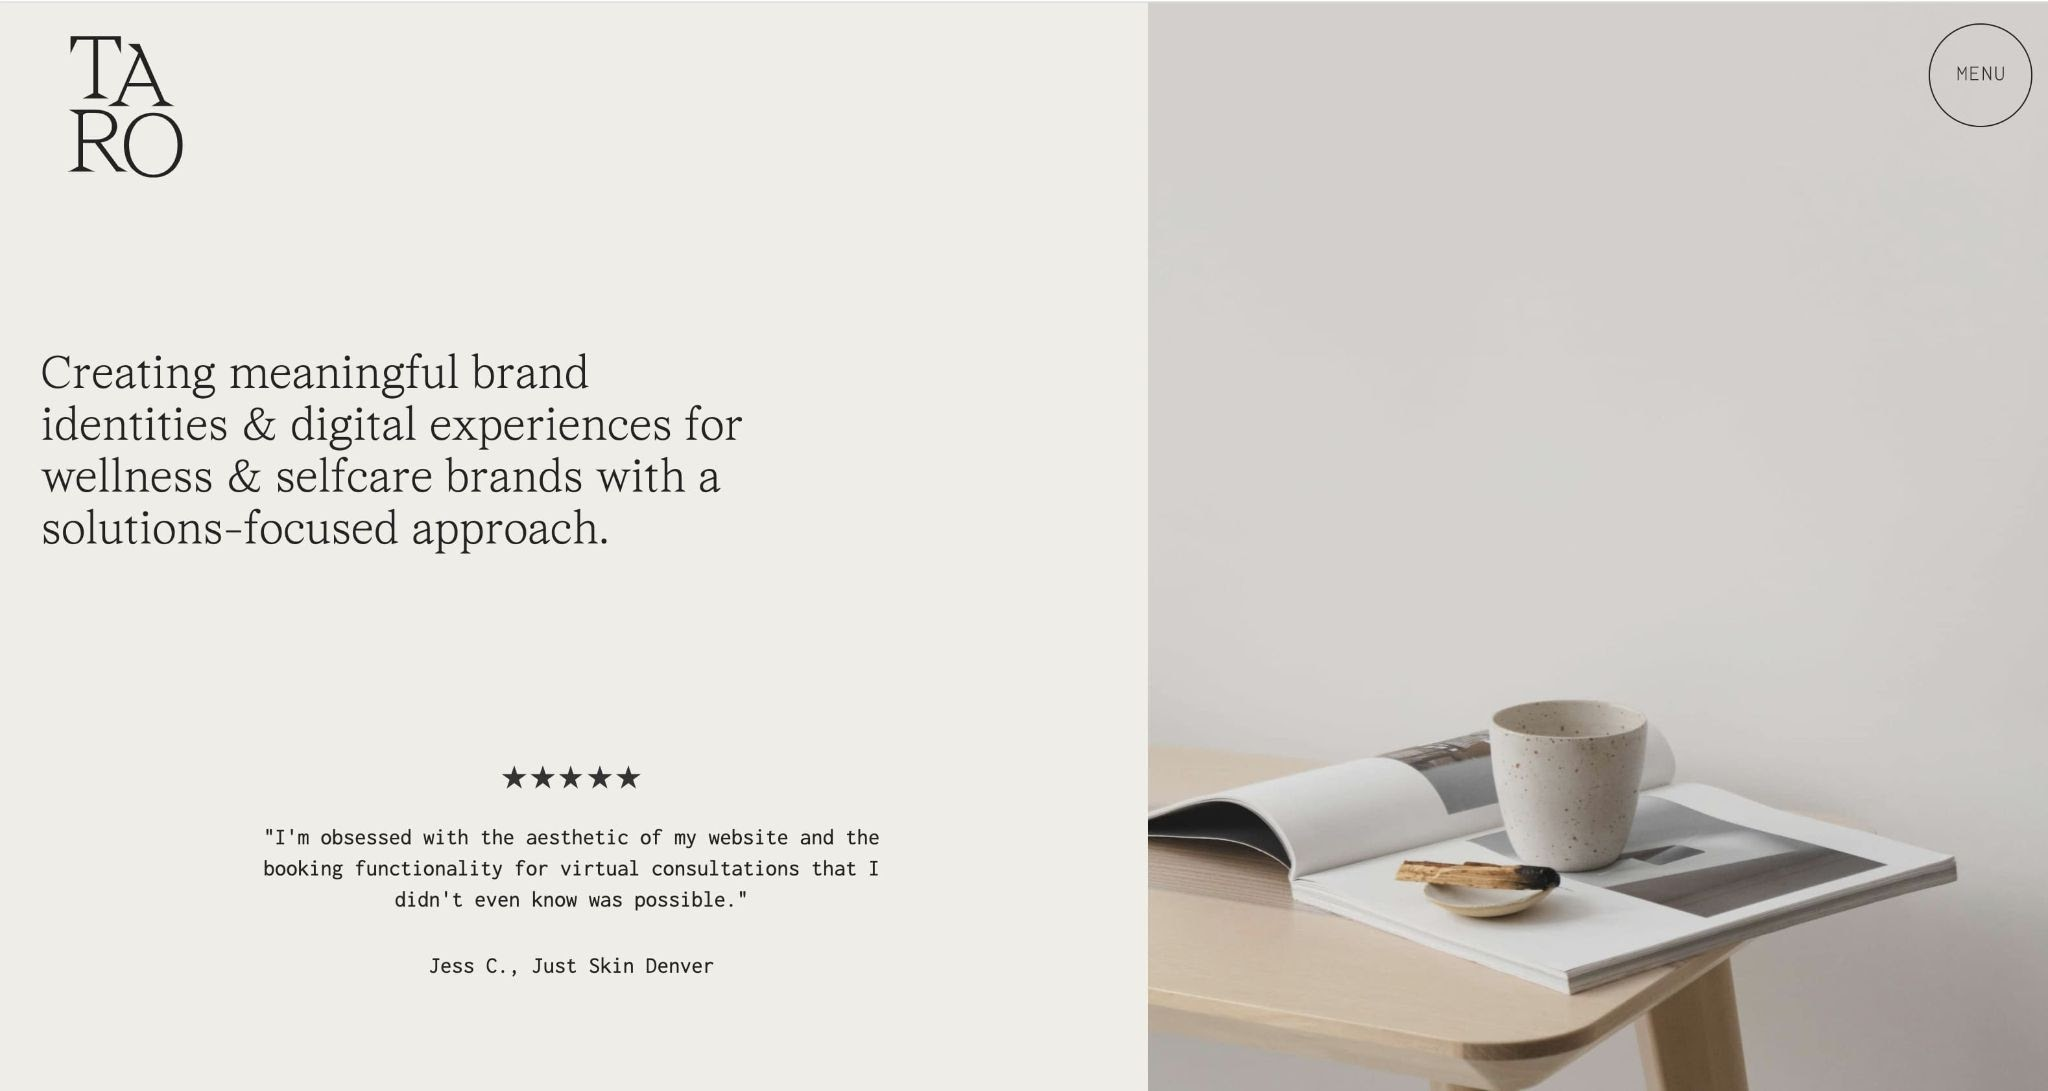 An image of the Taro Design Co. website